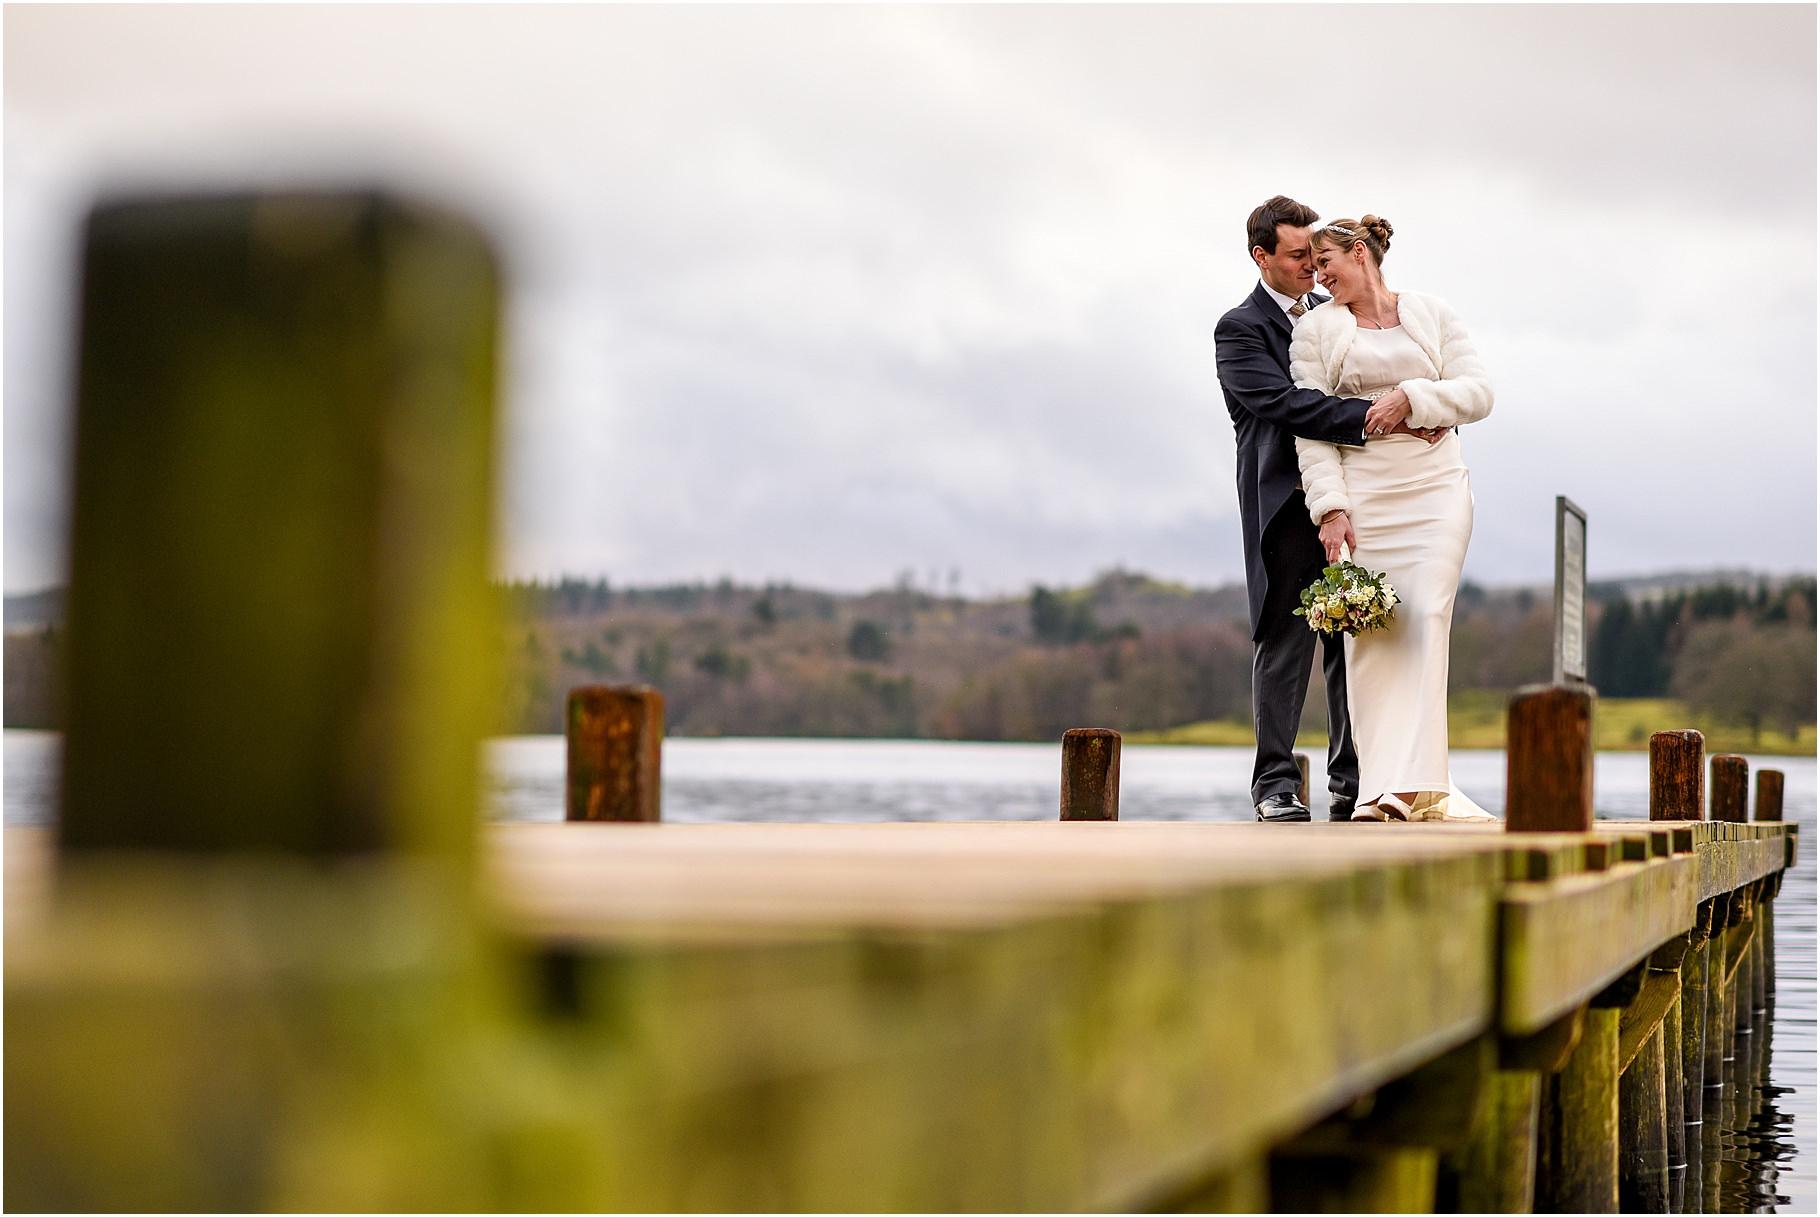 dan-wootton-photography-2017-weddings-183.jpg